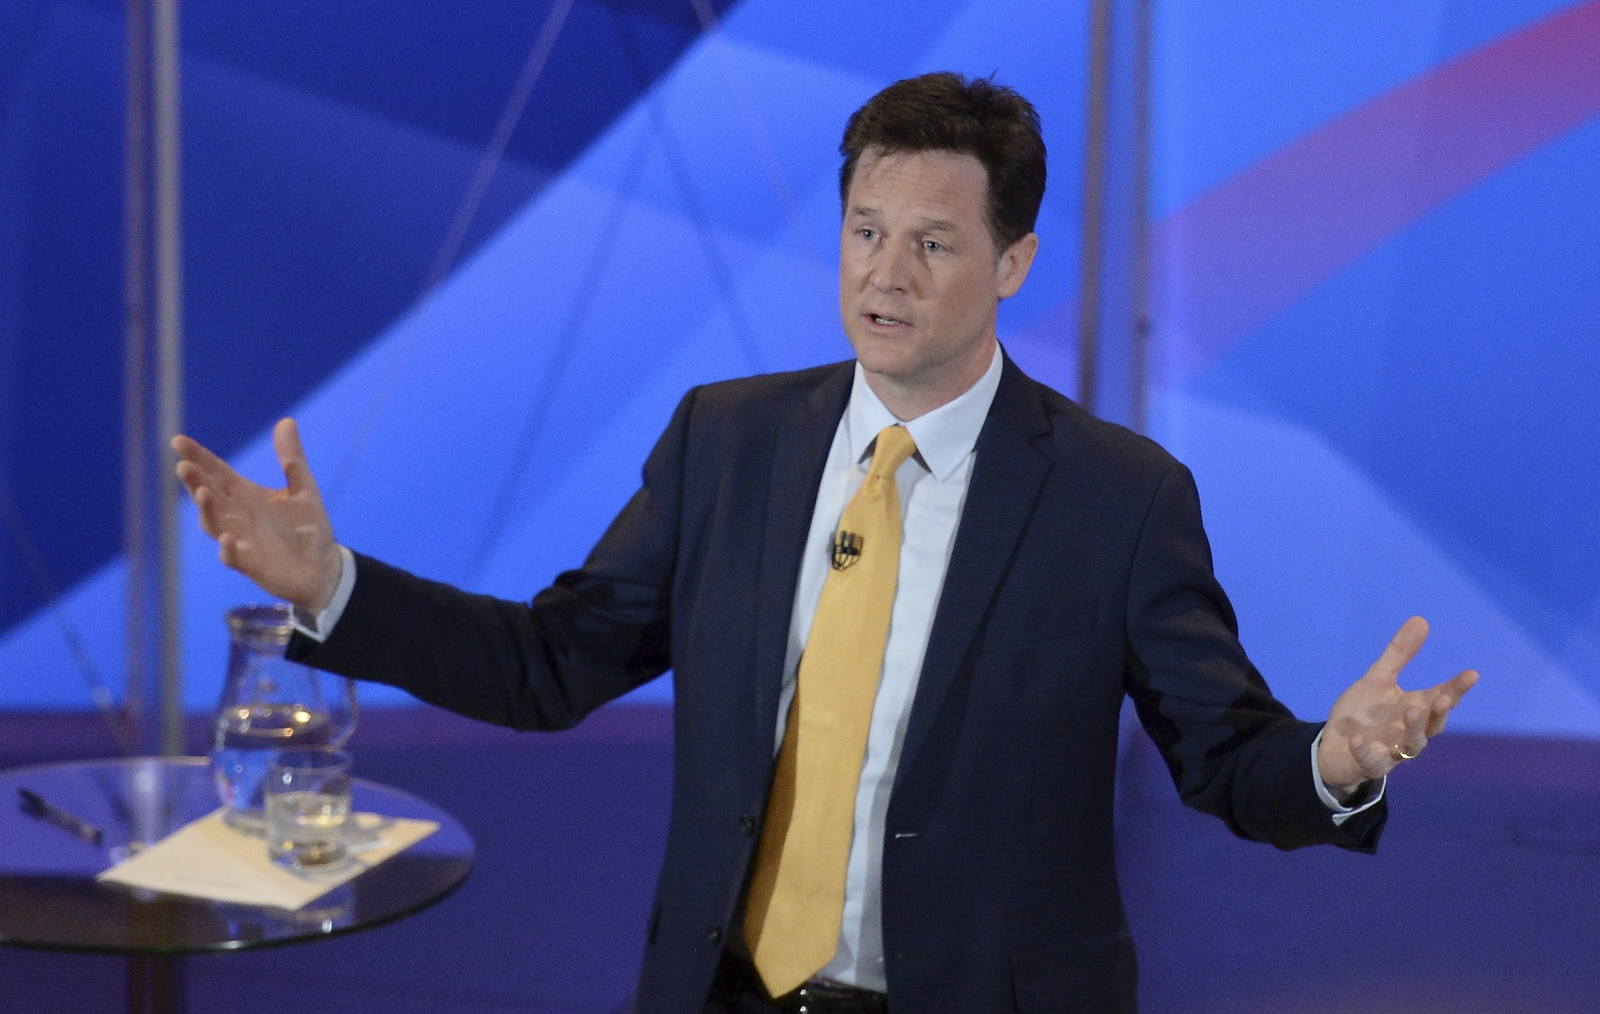 Nick Clegg former deputy PM